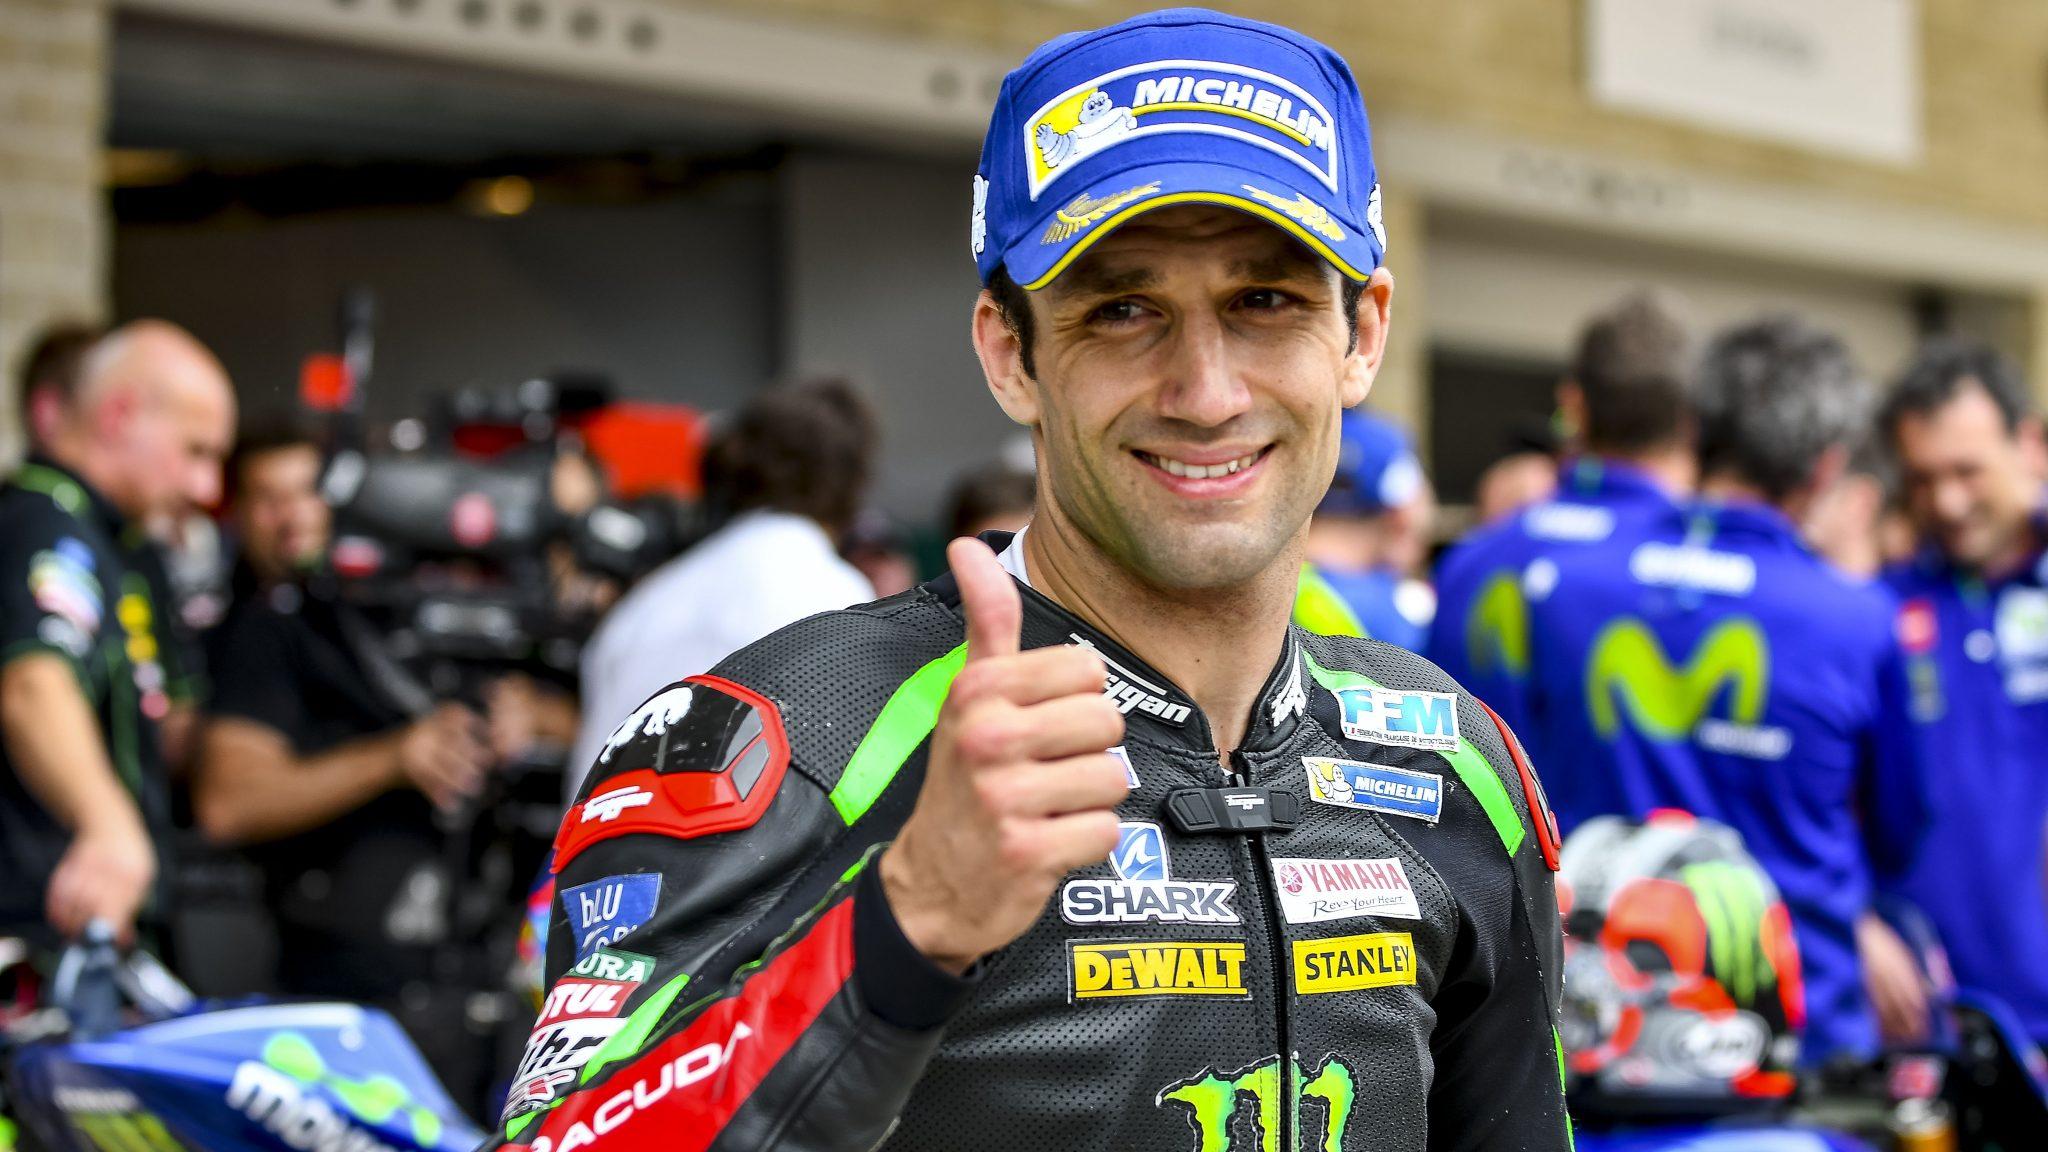 MotoGP – Red Bull KTM confirms Johann Zarco for two years